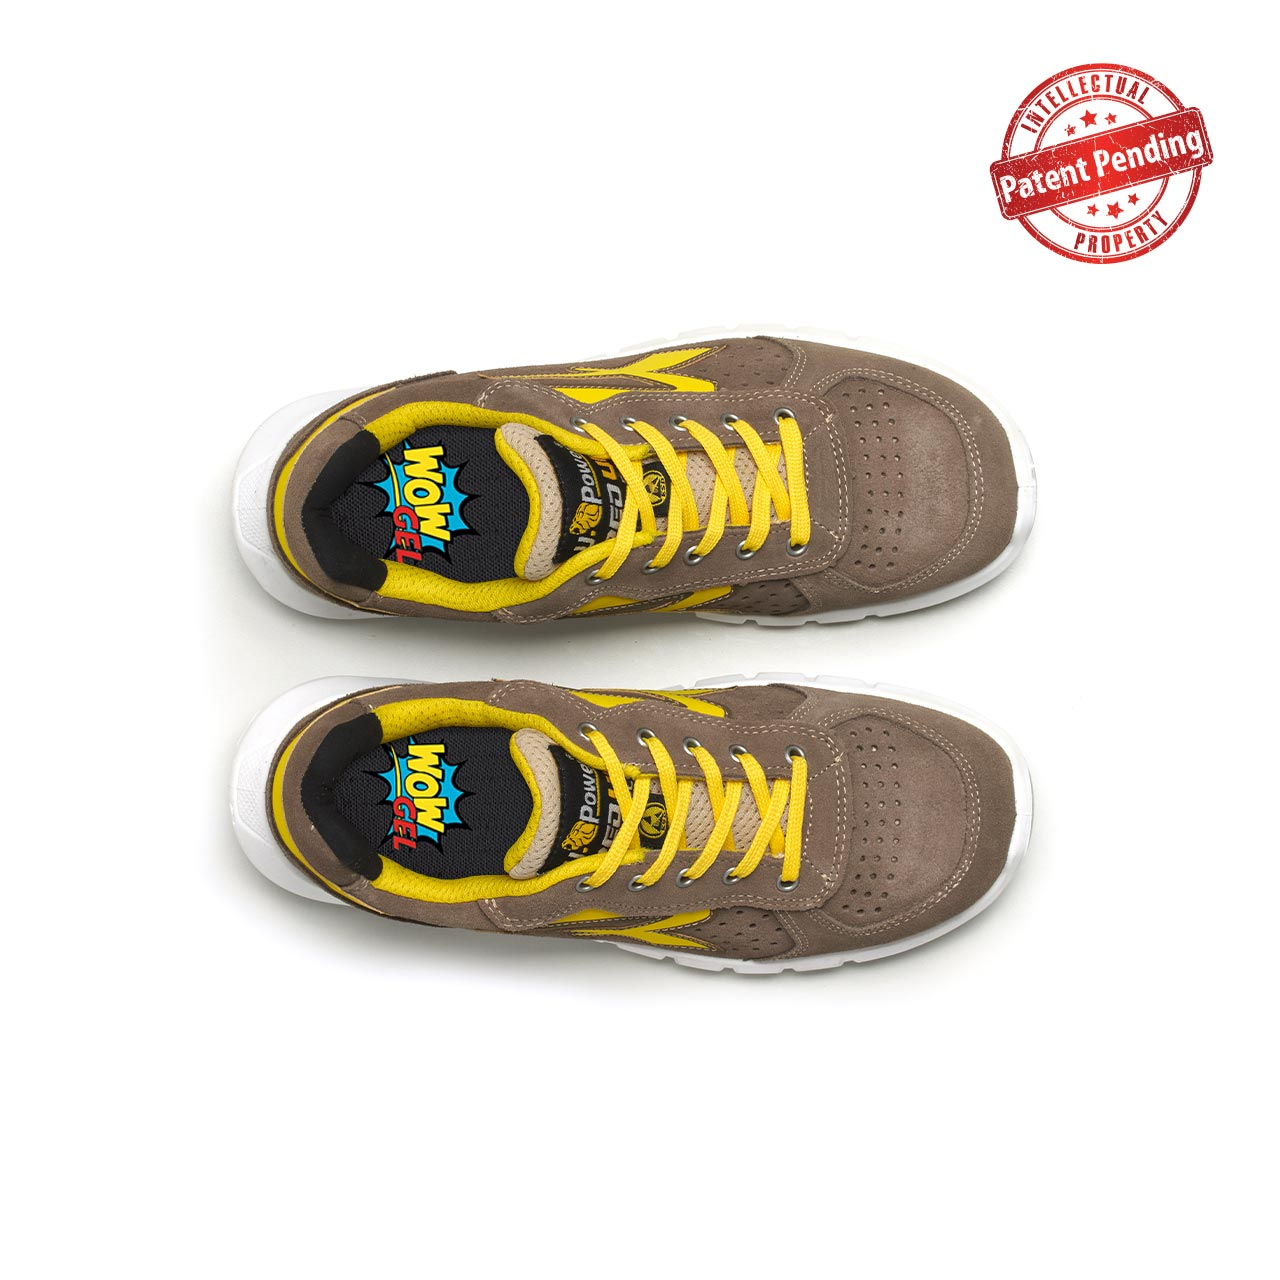 paio di scarpe antinfortunistiche upower modello dorado plus linea redup plus vista top